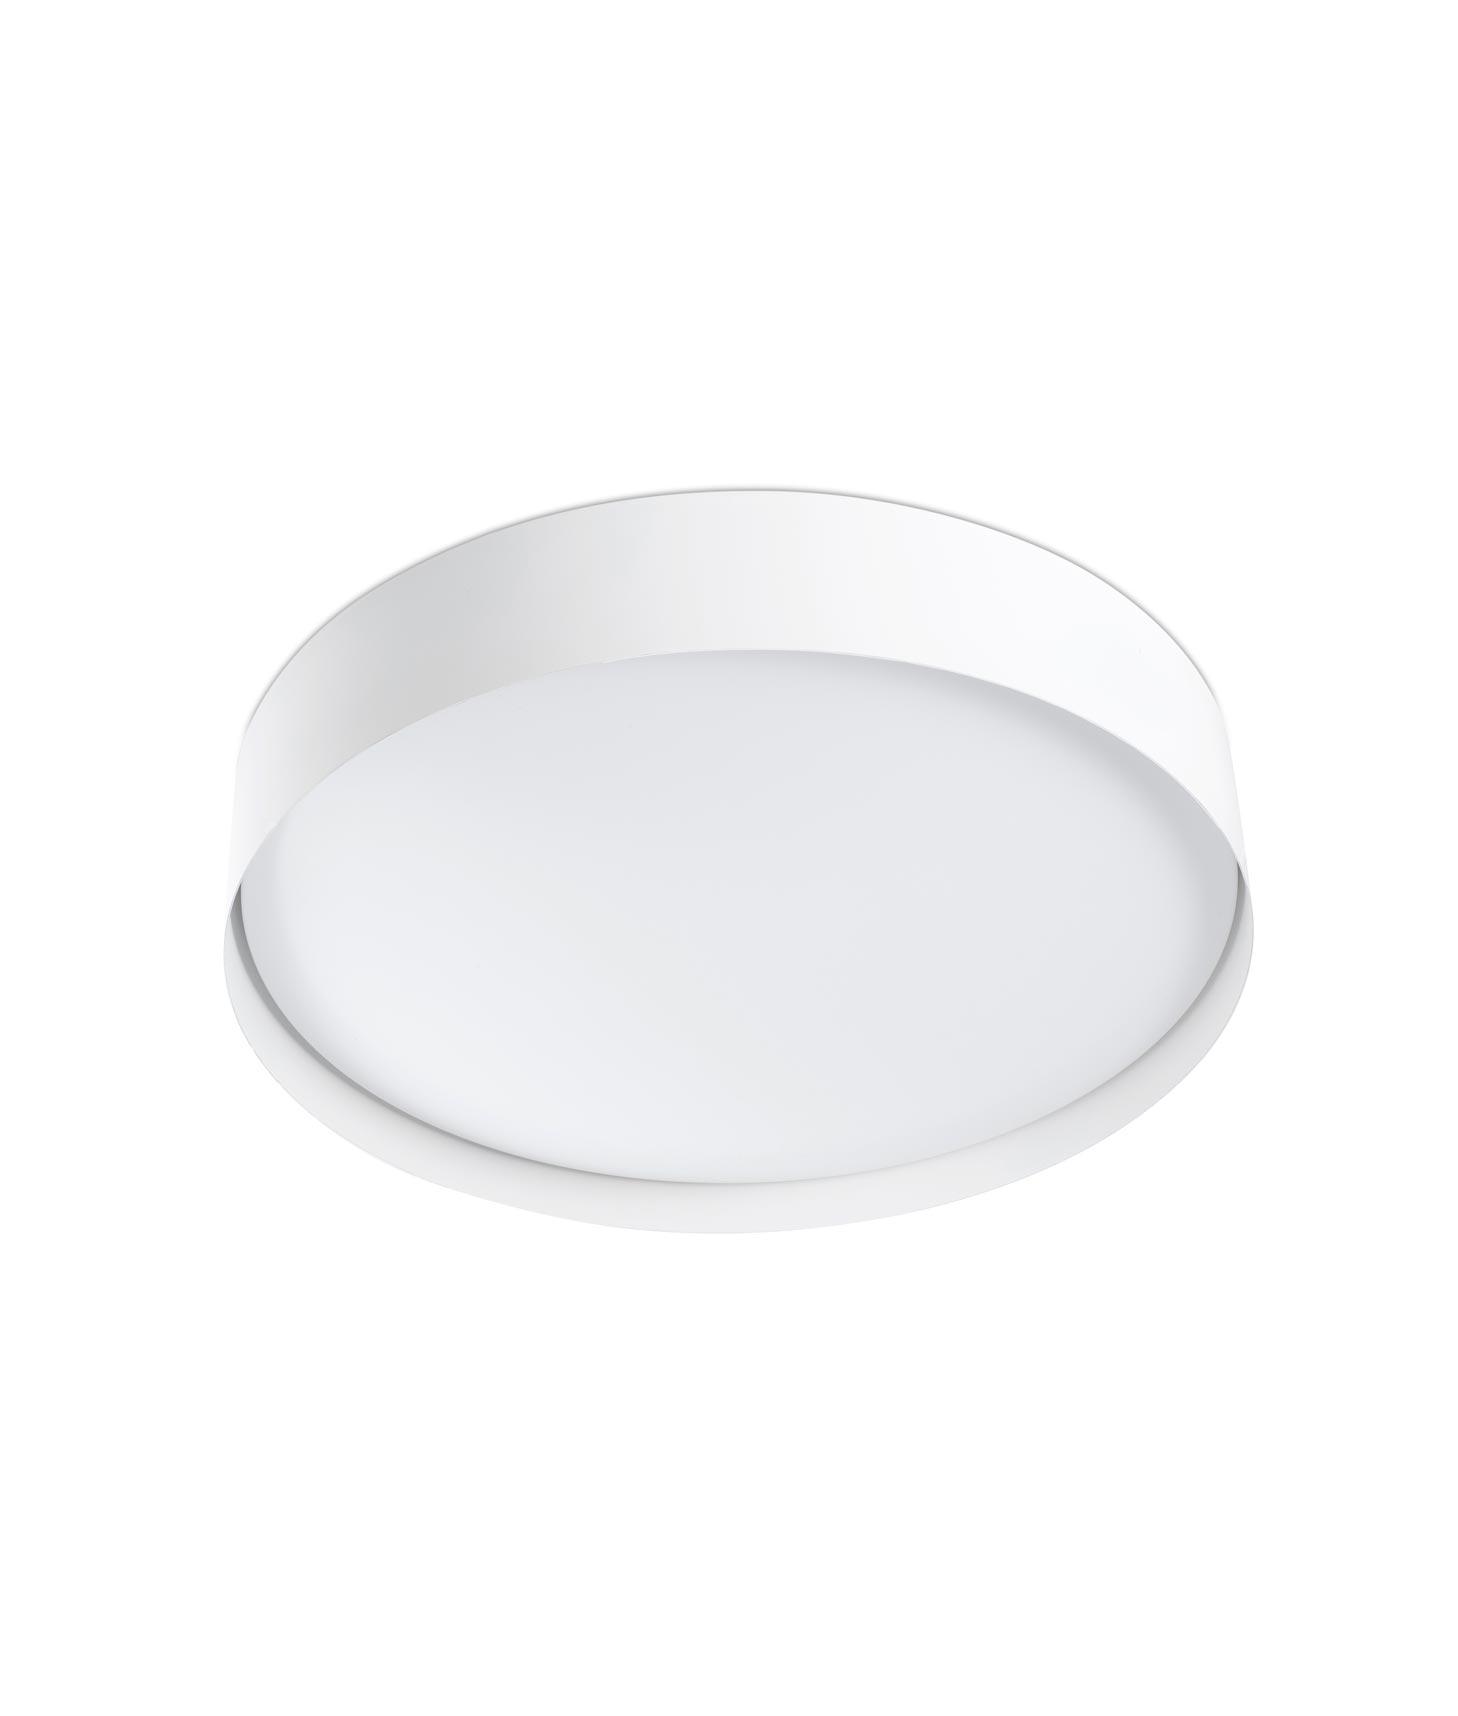 Plafón de techo LED VUK blanco